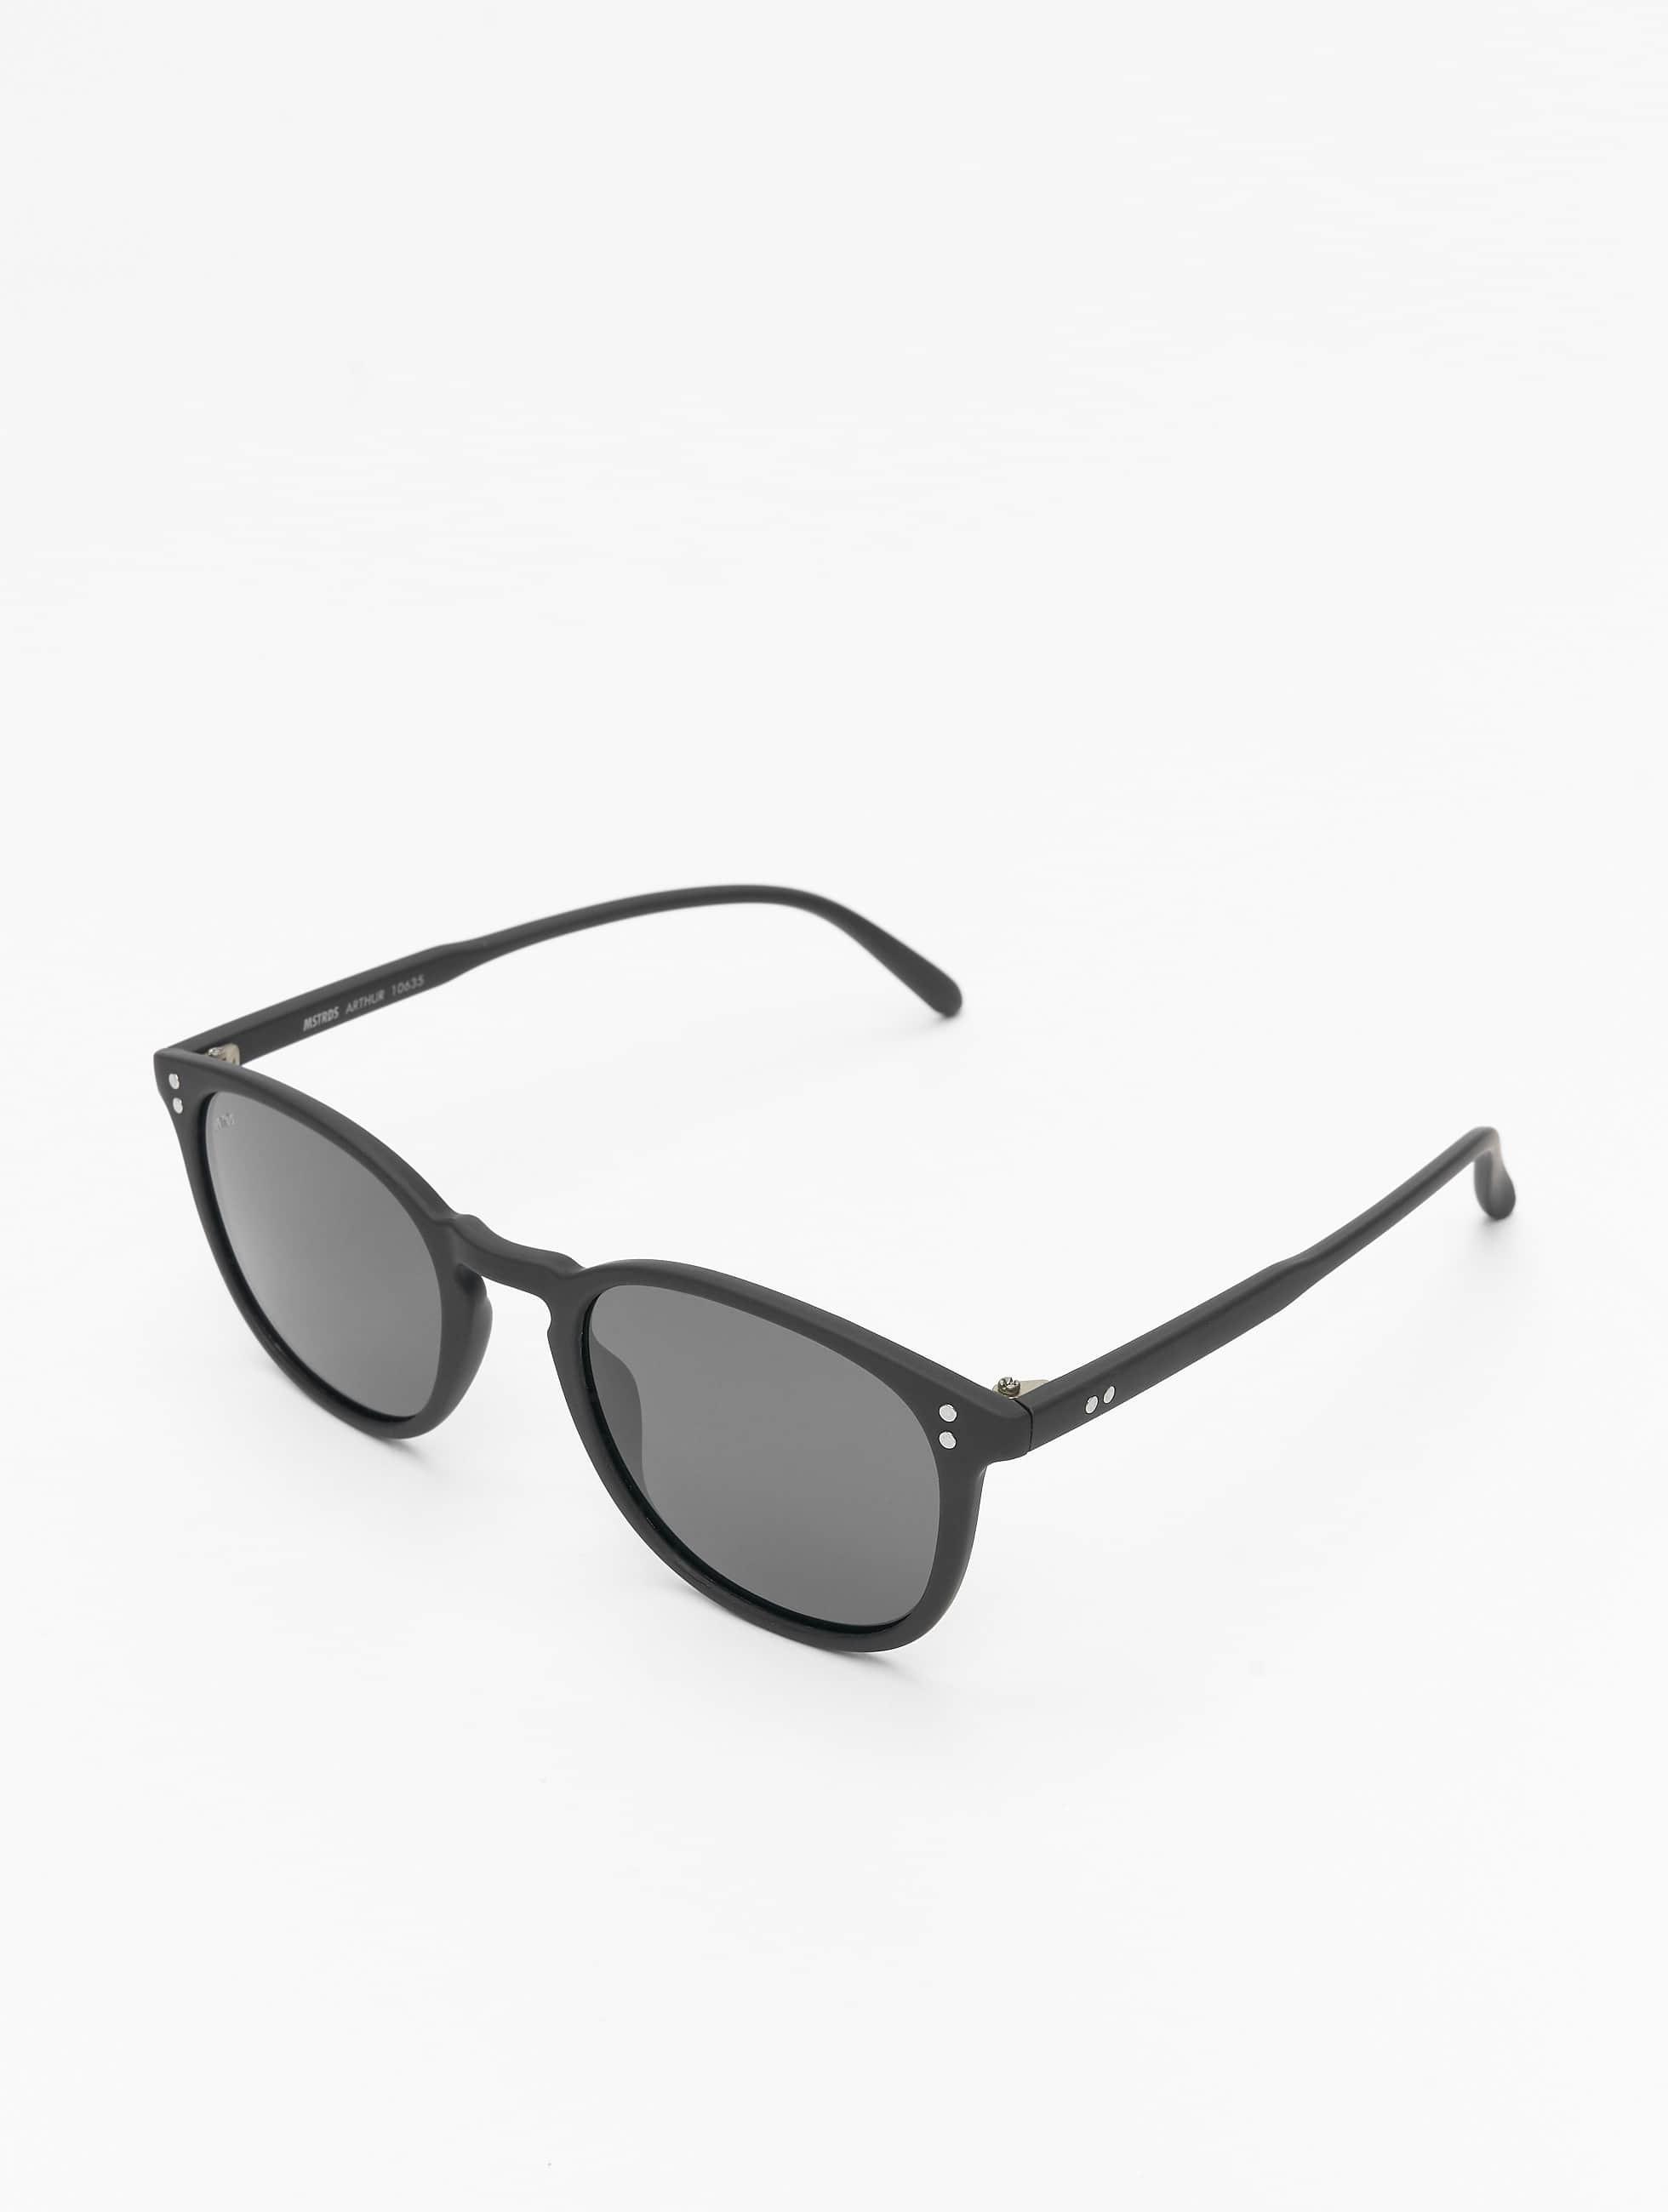 mstrds sonnenbrille arthur polarized mirror in schwarz 267882. Black Bedroom Furniture Sets. Home Design Ideas